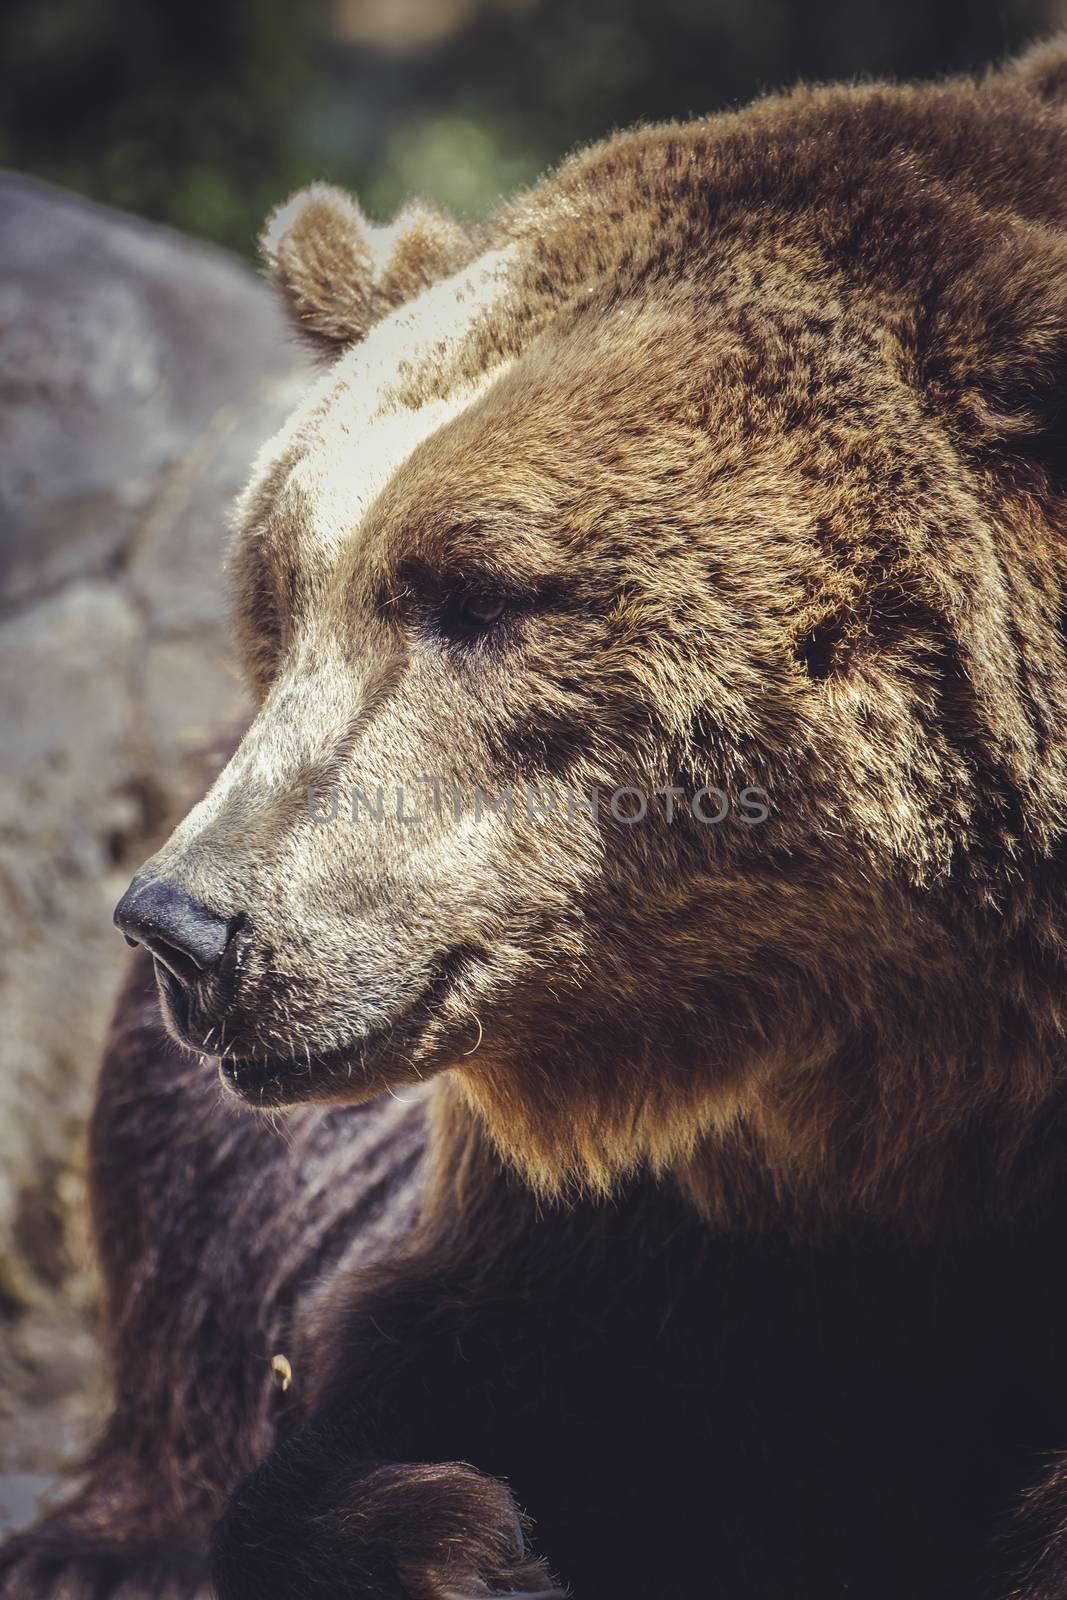 danger, Spanish powerful brown bear, huge and strong  wild animal